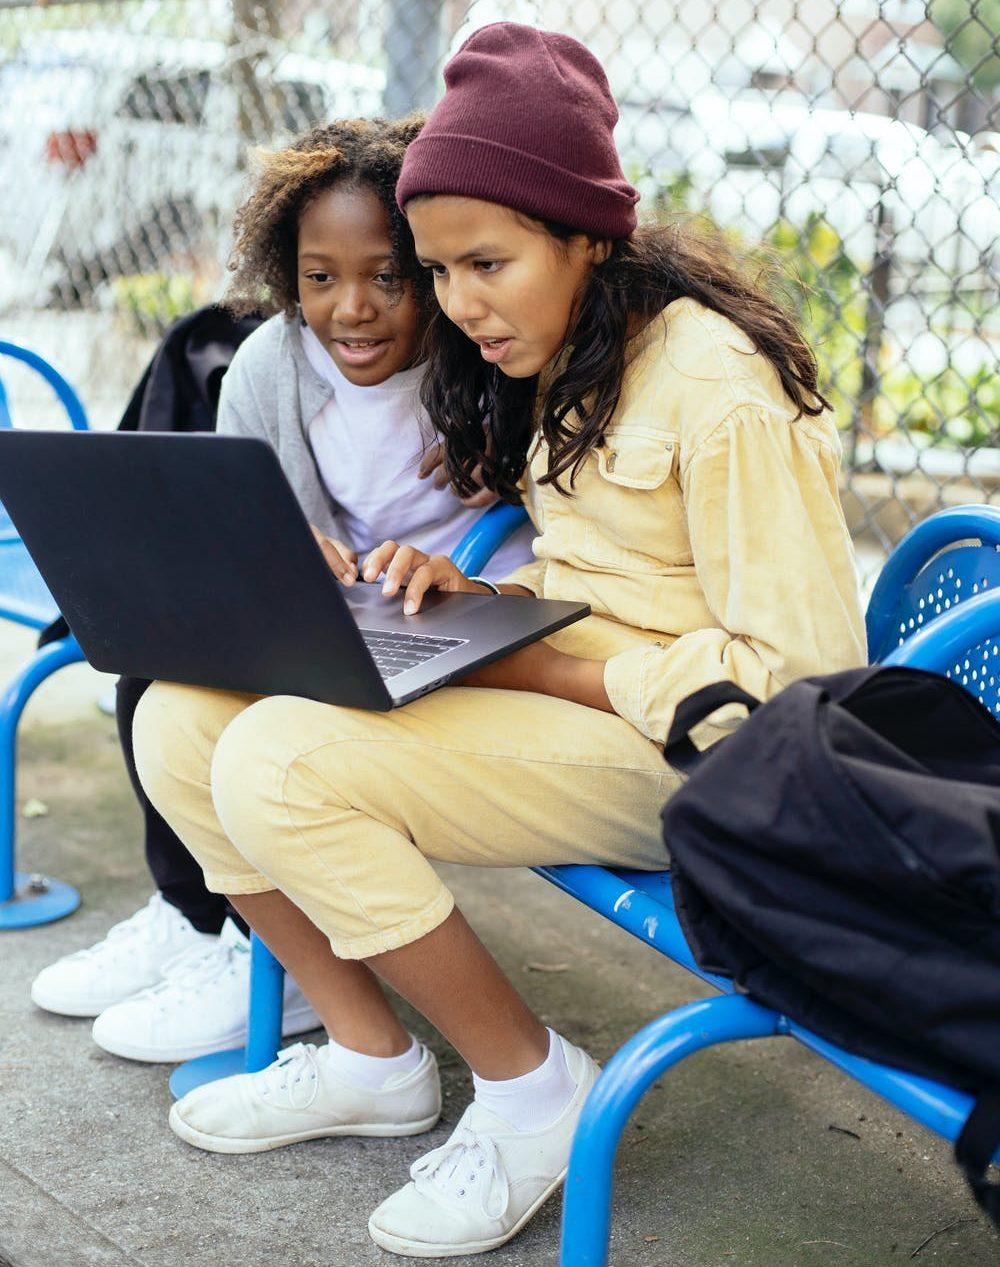 online academy to e-commerce platform